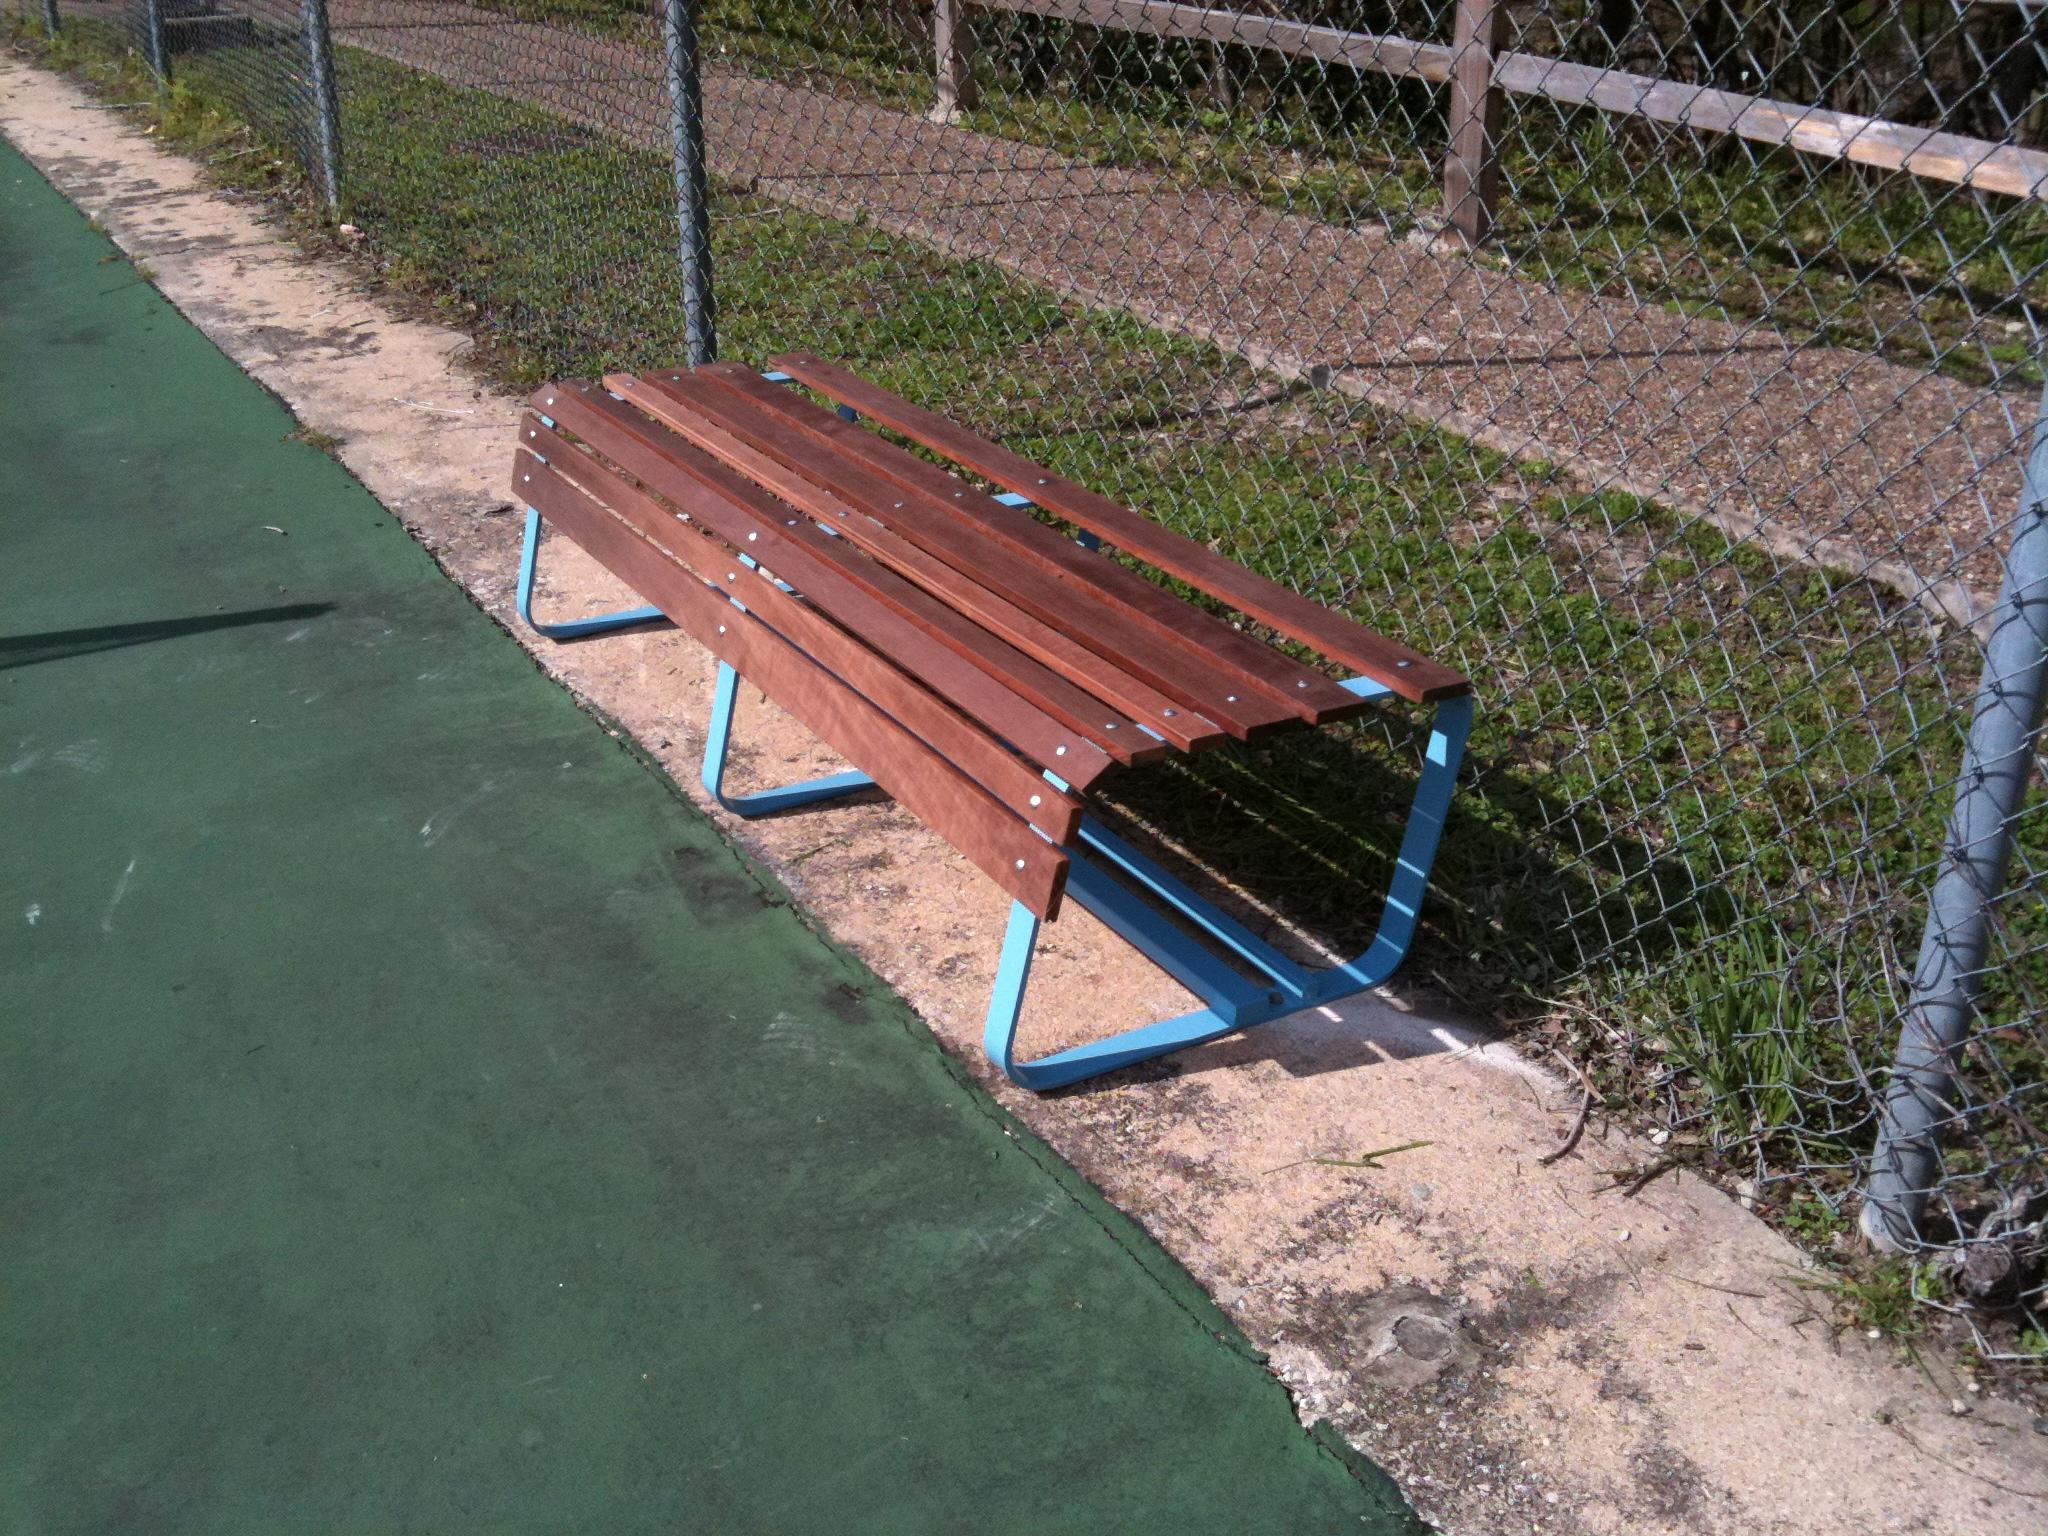 TennisBench1_02.JPG